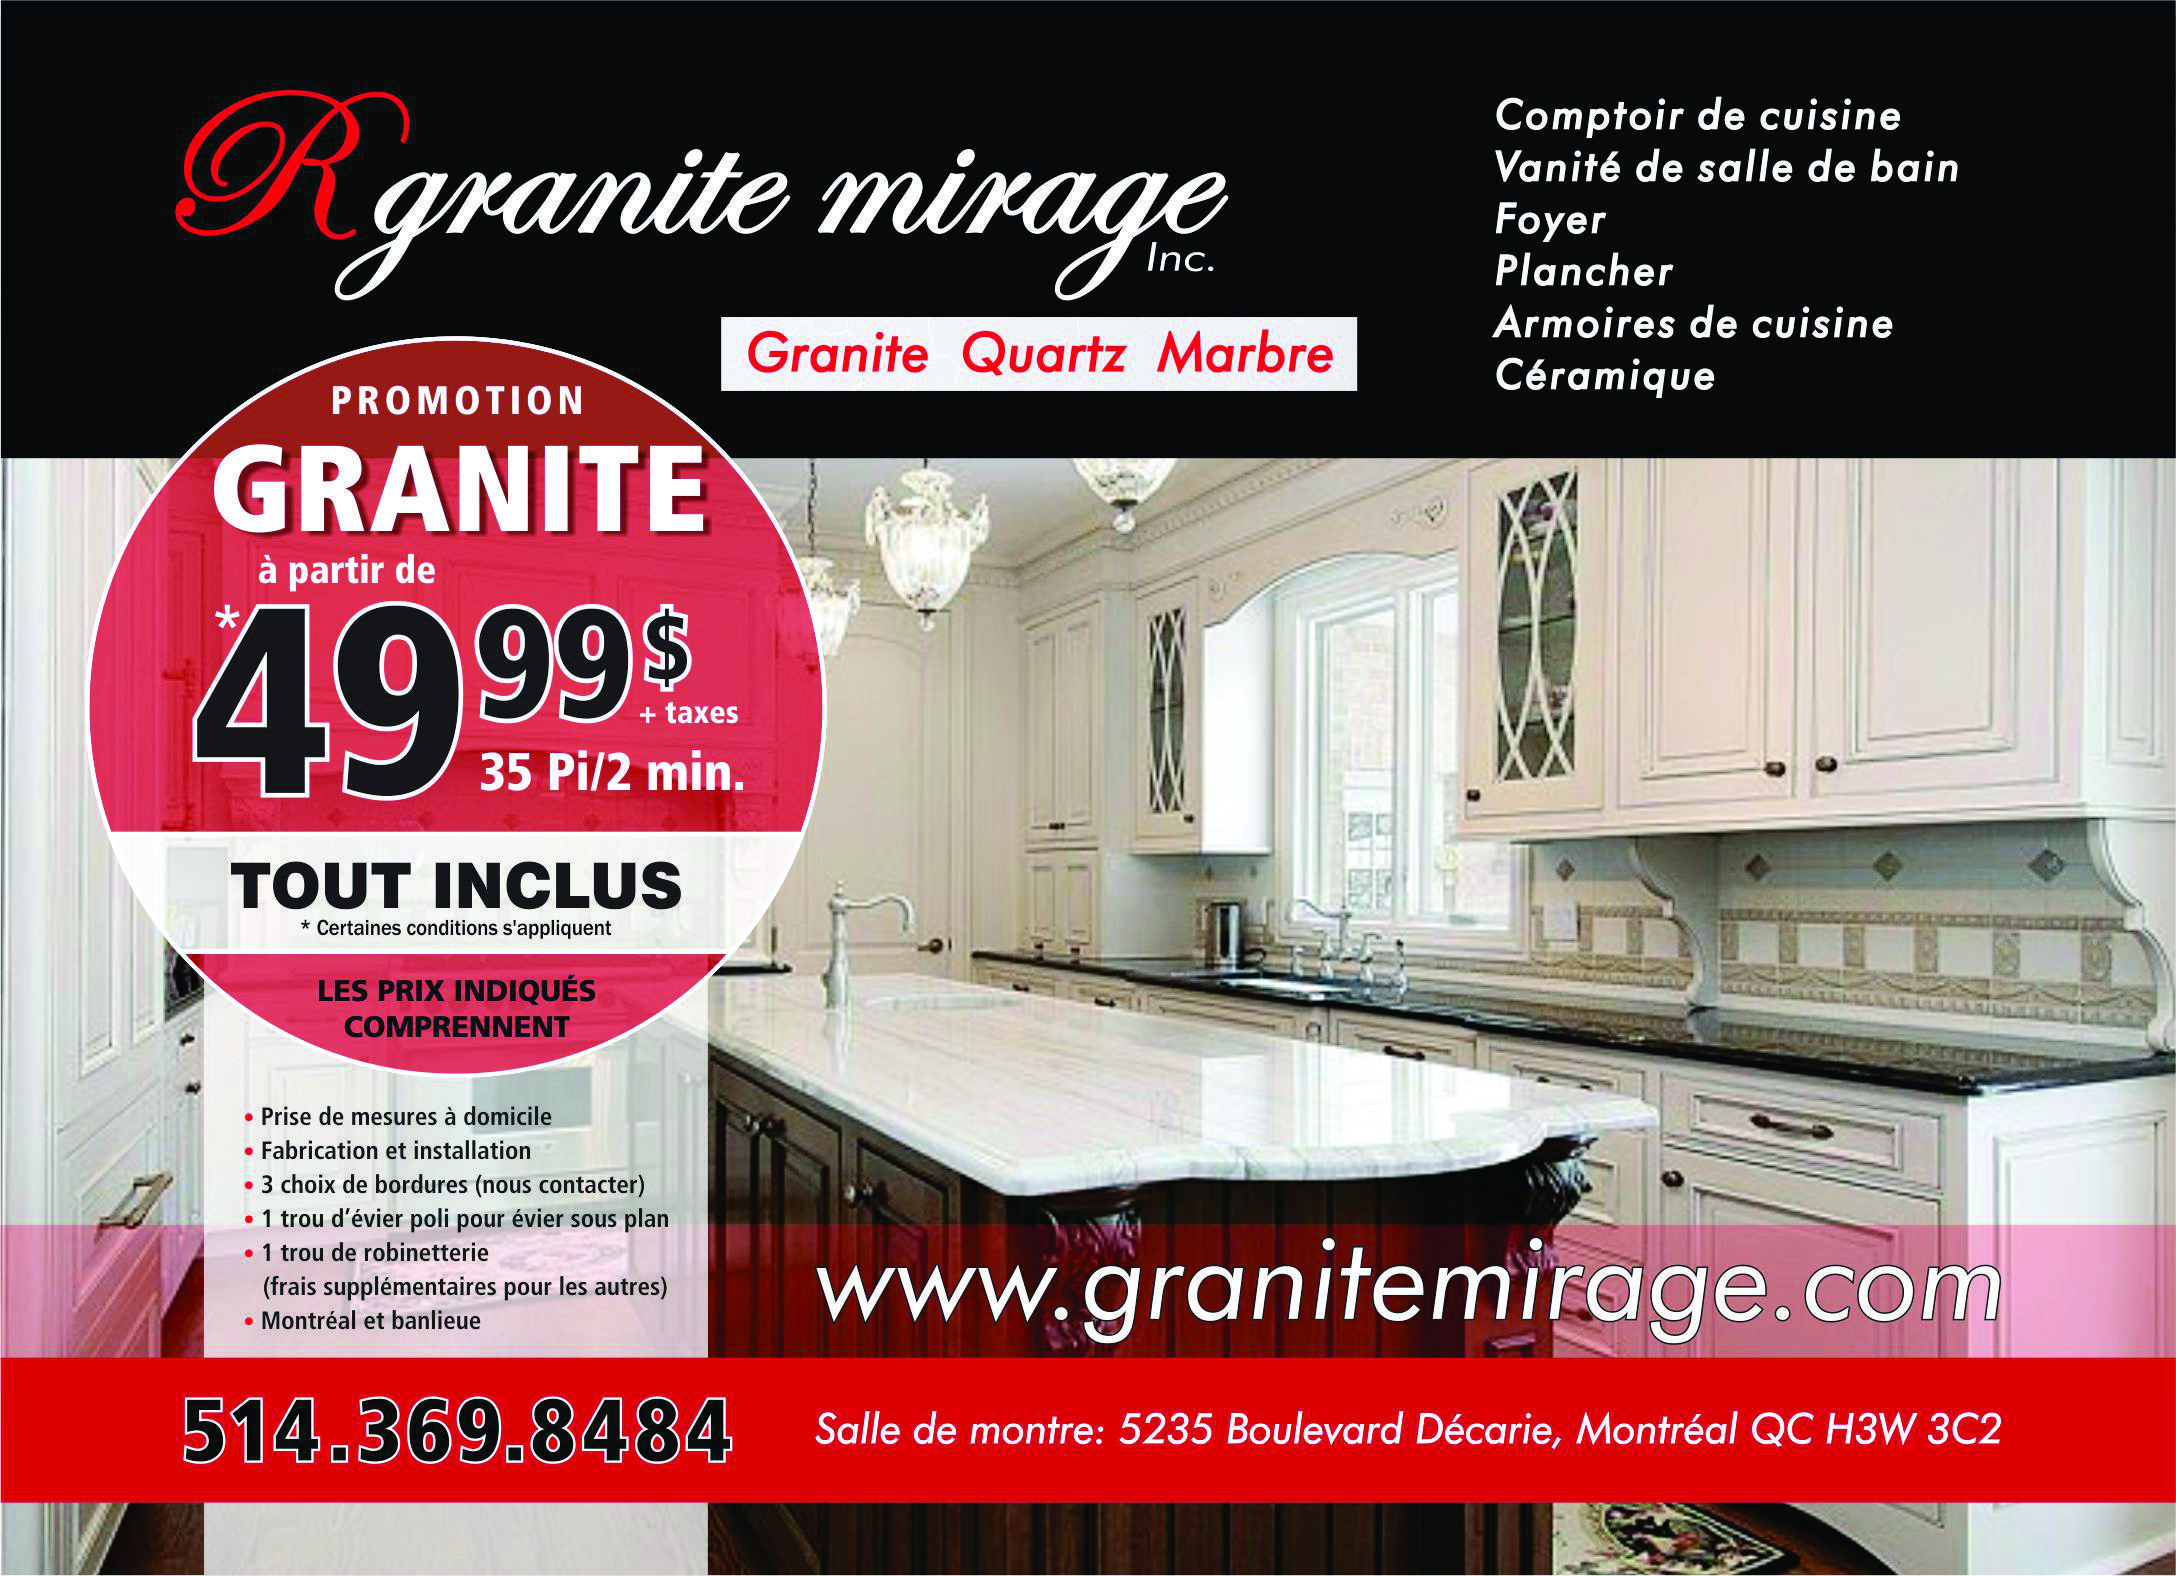 R Granite Mirage inc granitemirage on Pinterest